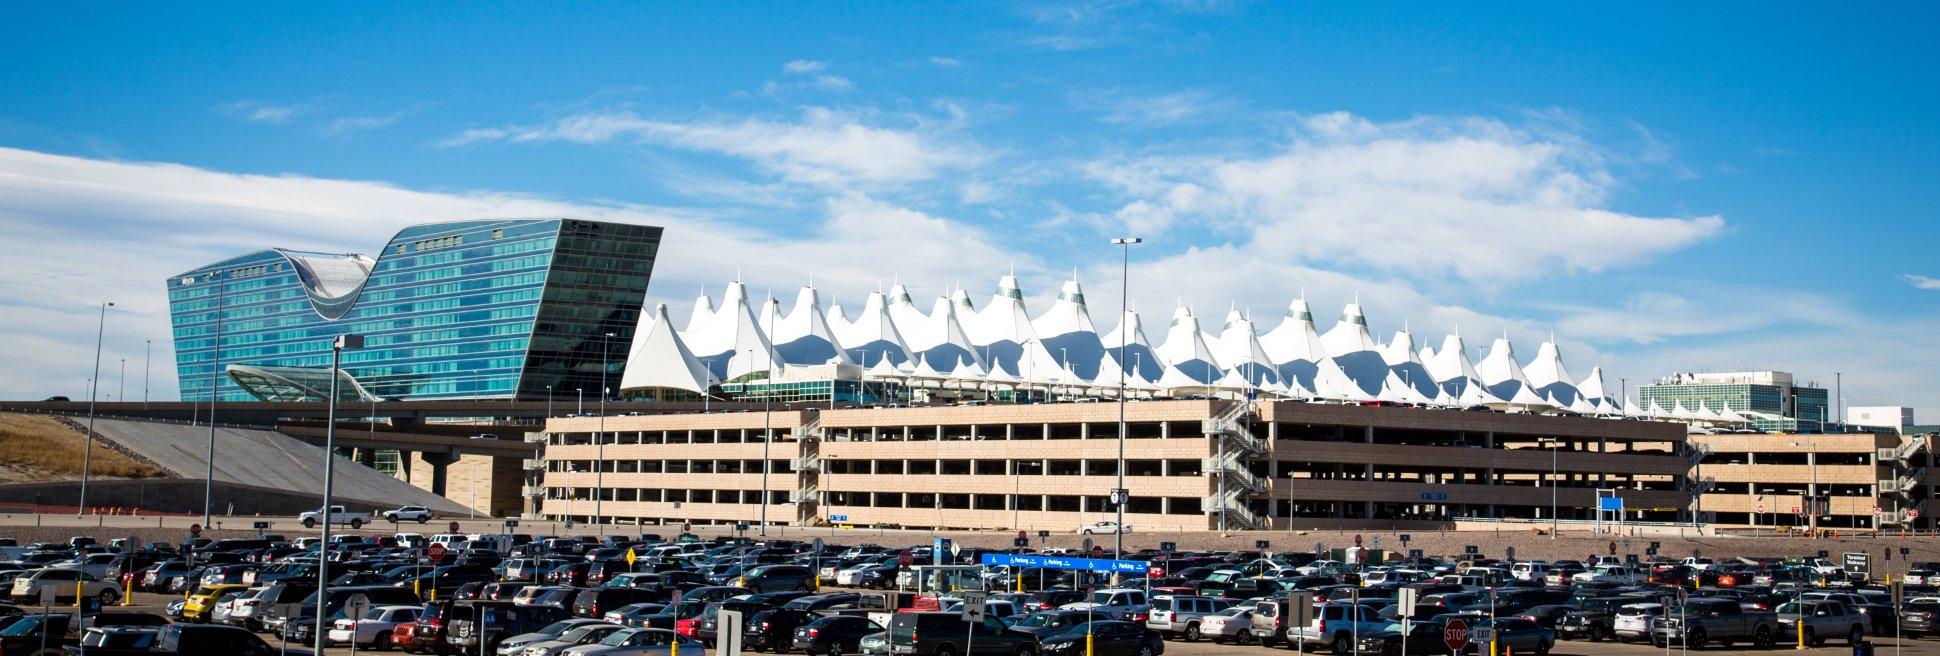 Parking Lots Denver International Airport